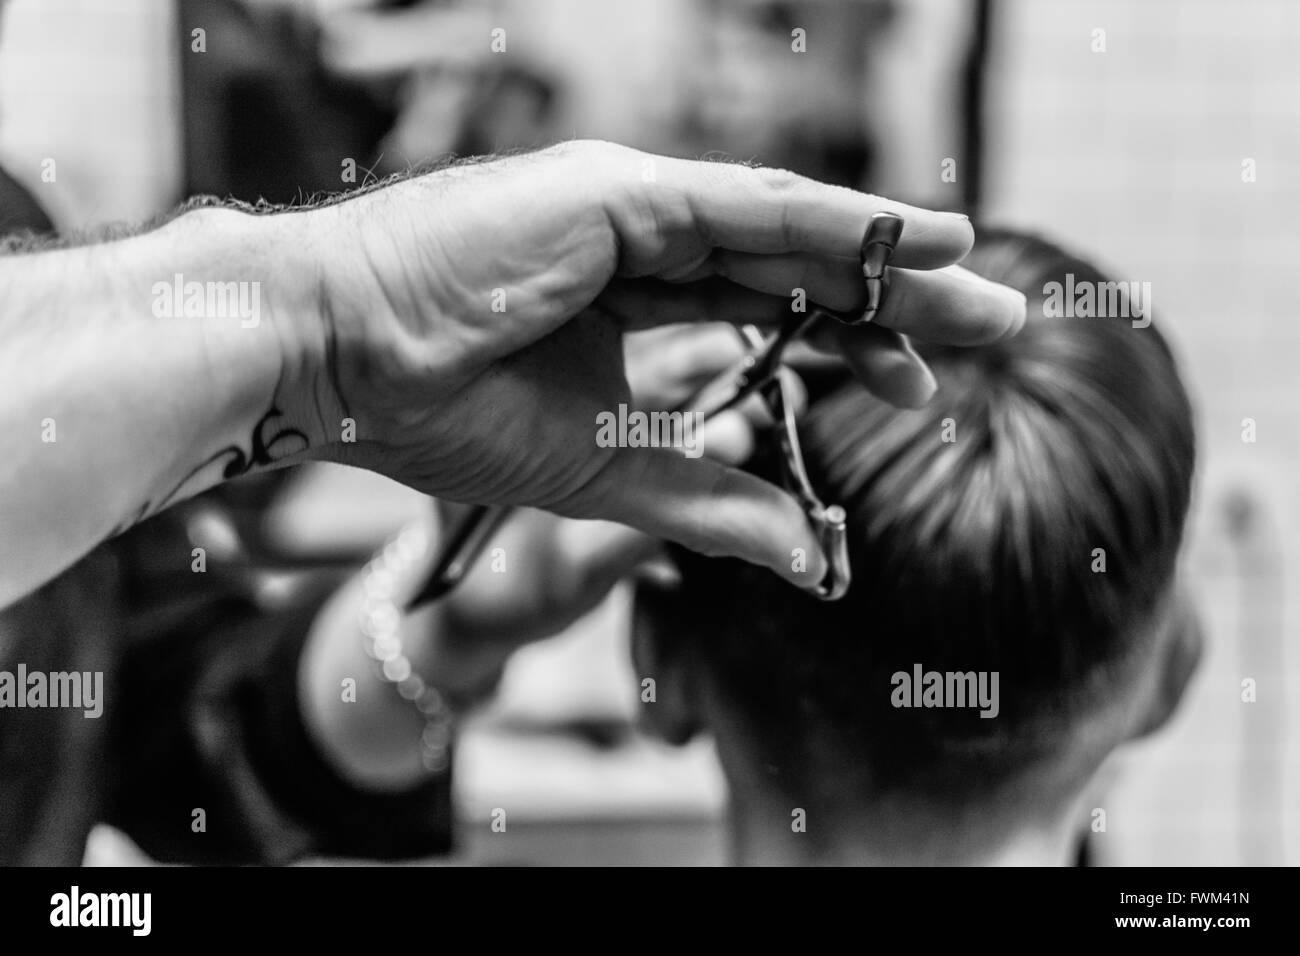 Hairdresser Cutting Boy Hair At Salon - Stock Image